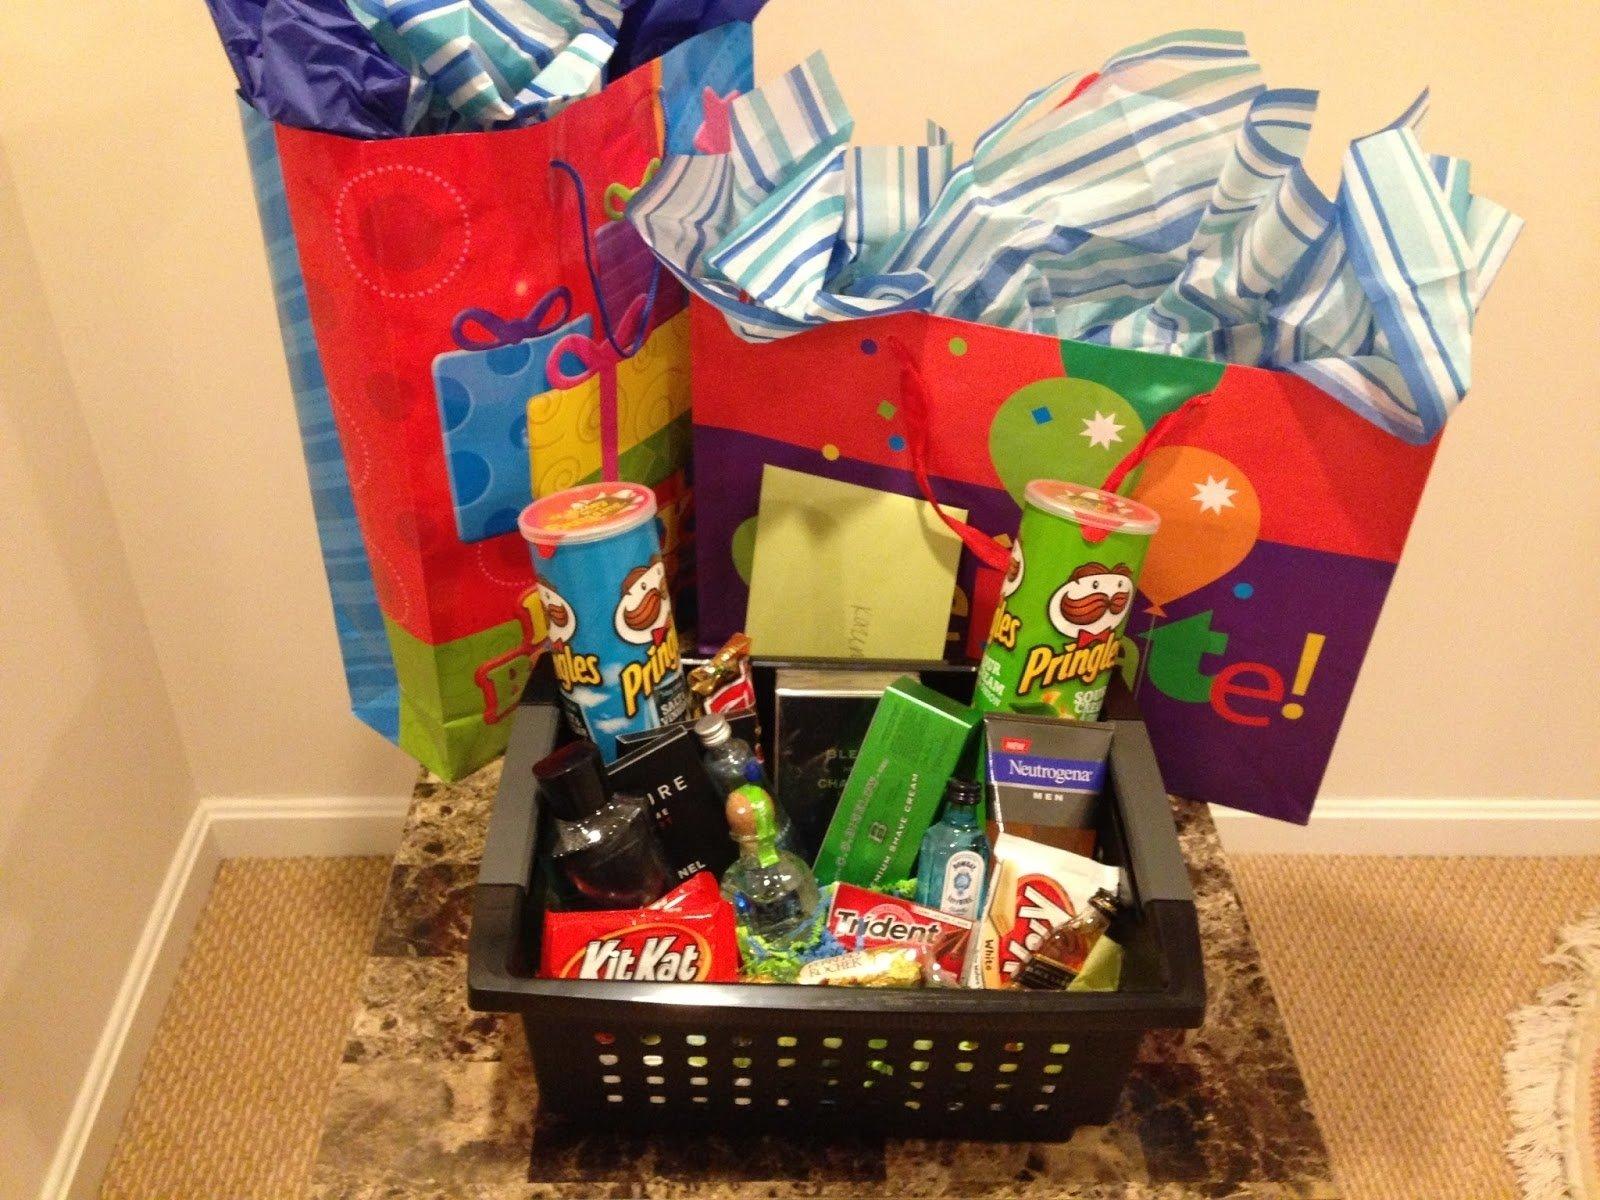 10 Stylish Gift Ideas For A New Boyfriend gift ideas for boyfriend gift ideas for boyfriends new job 3 2020